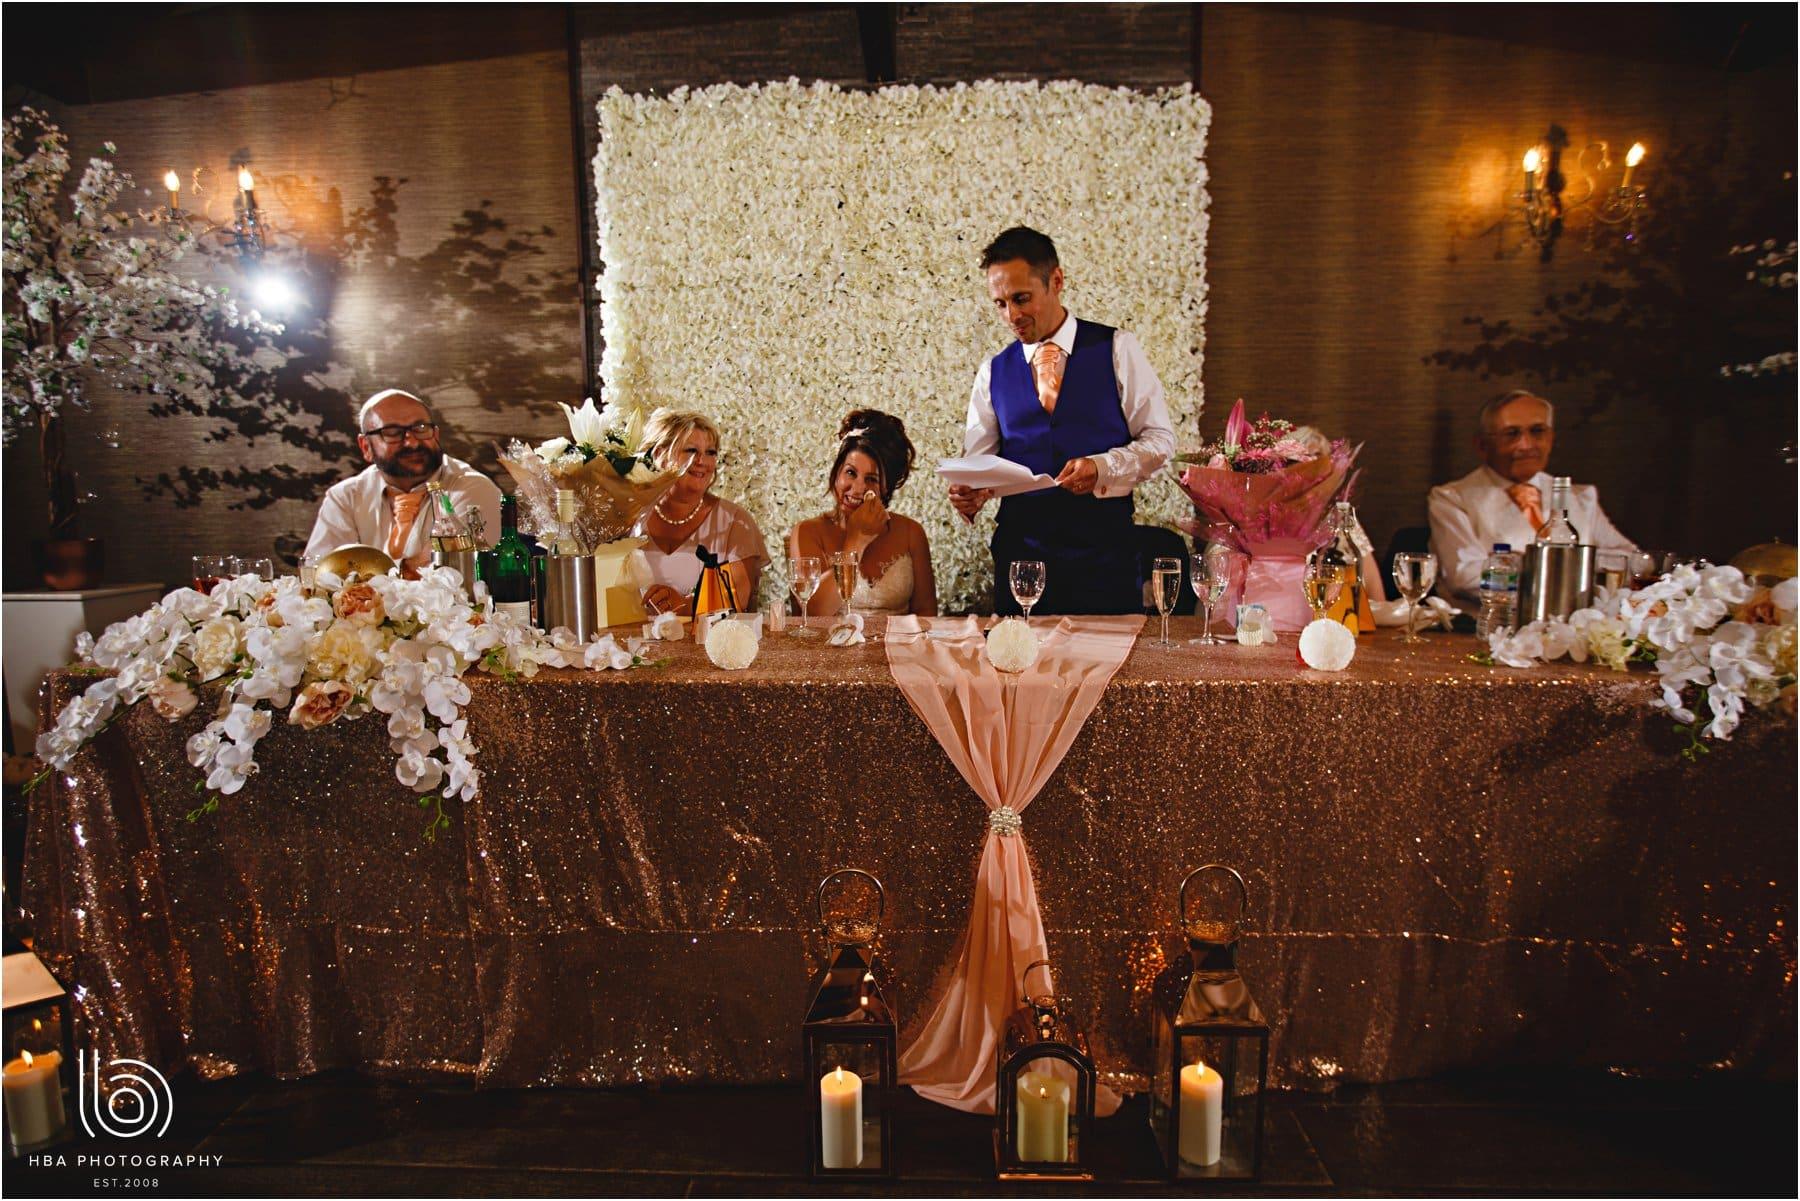 A Goosedale wedding